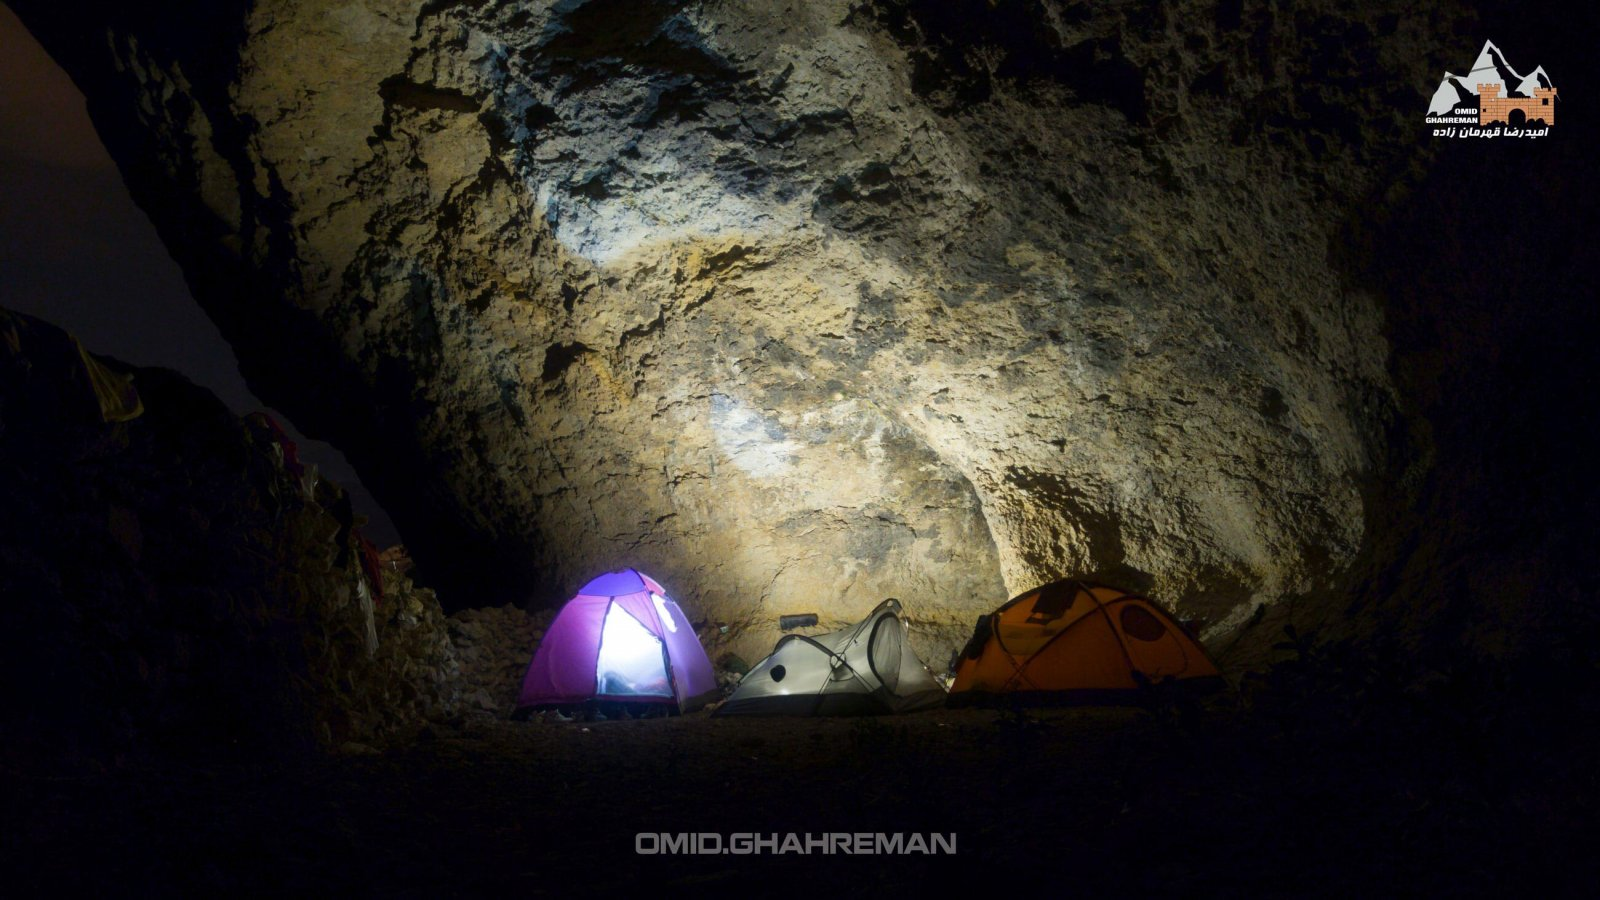 ماکو , کمپ و شب مانی در کوه قارلی